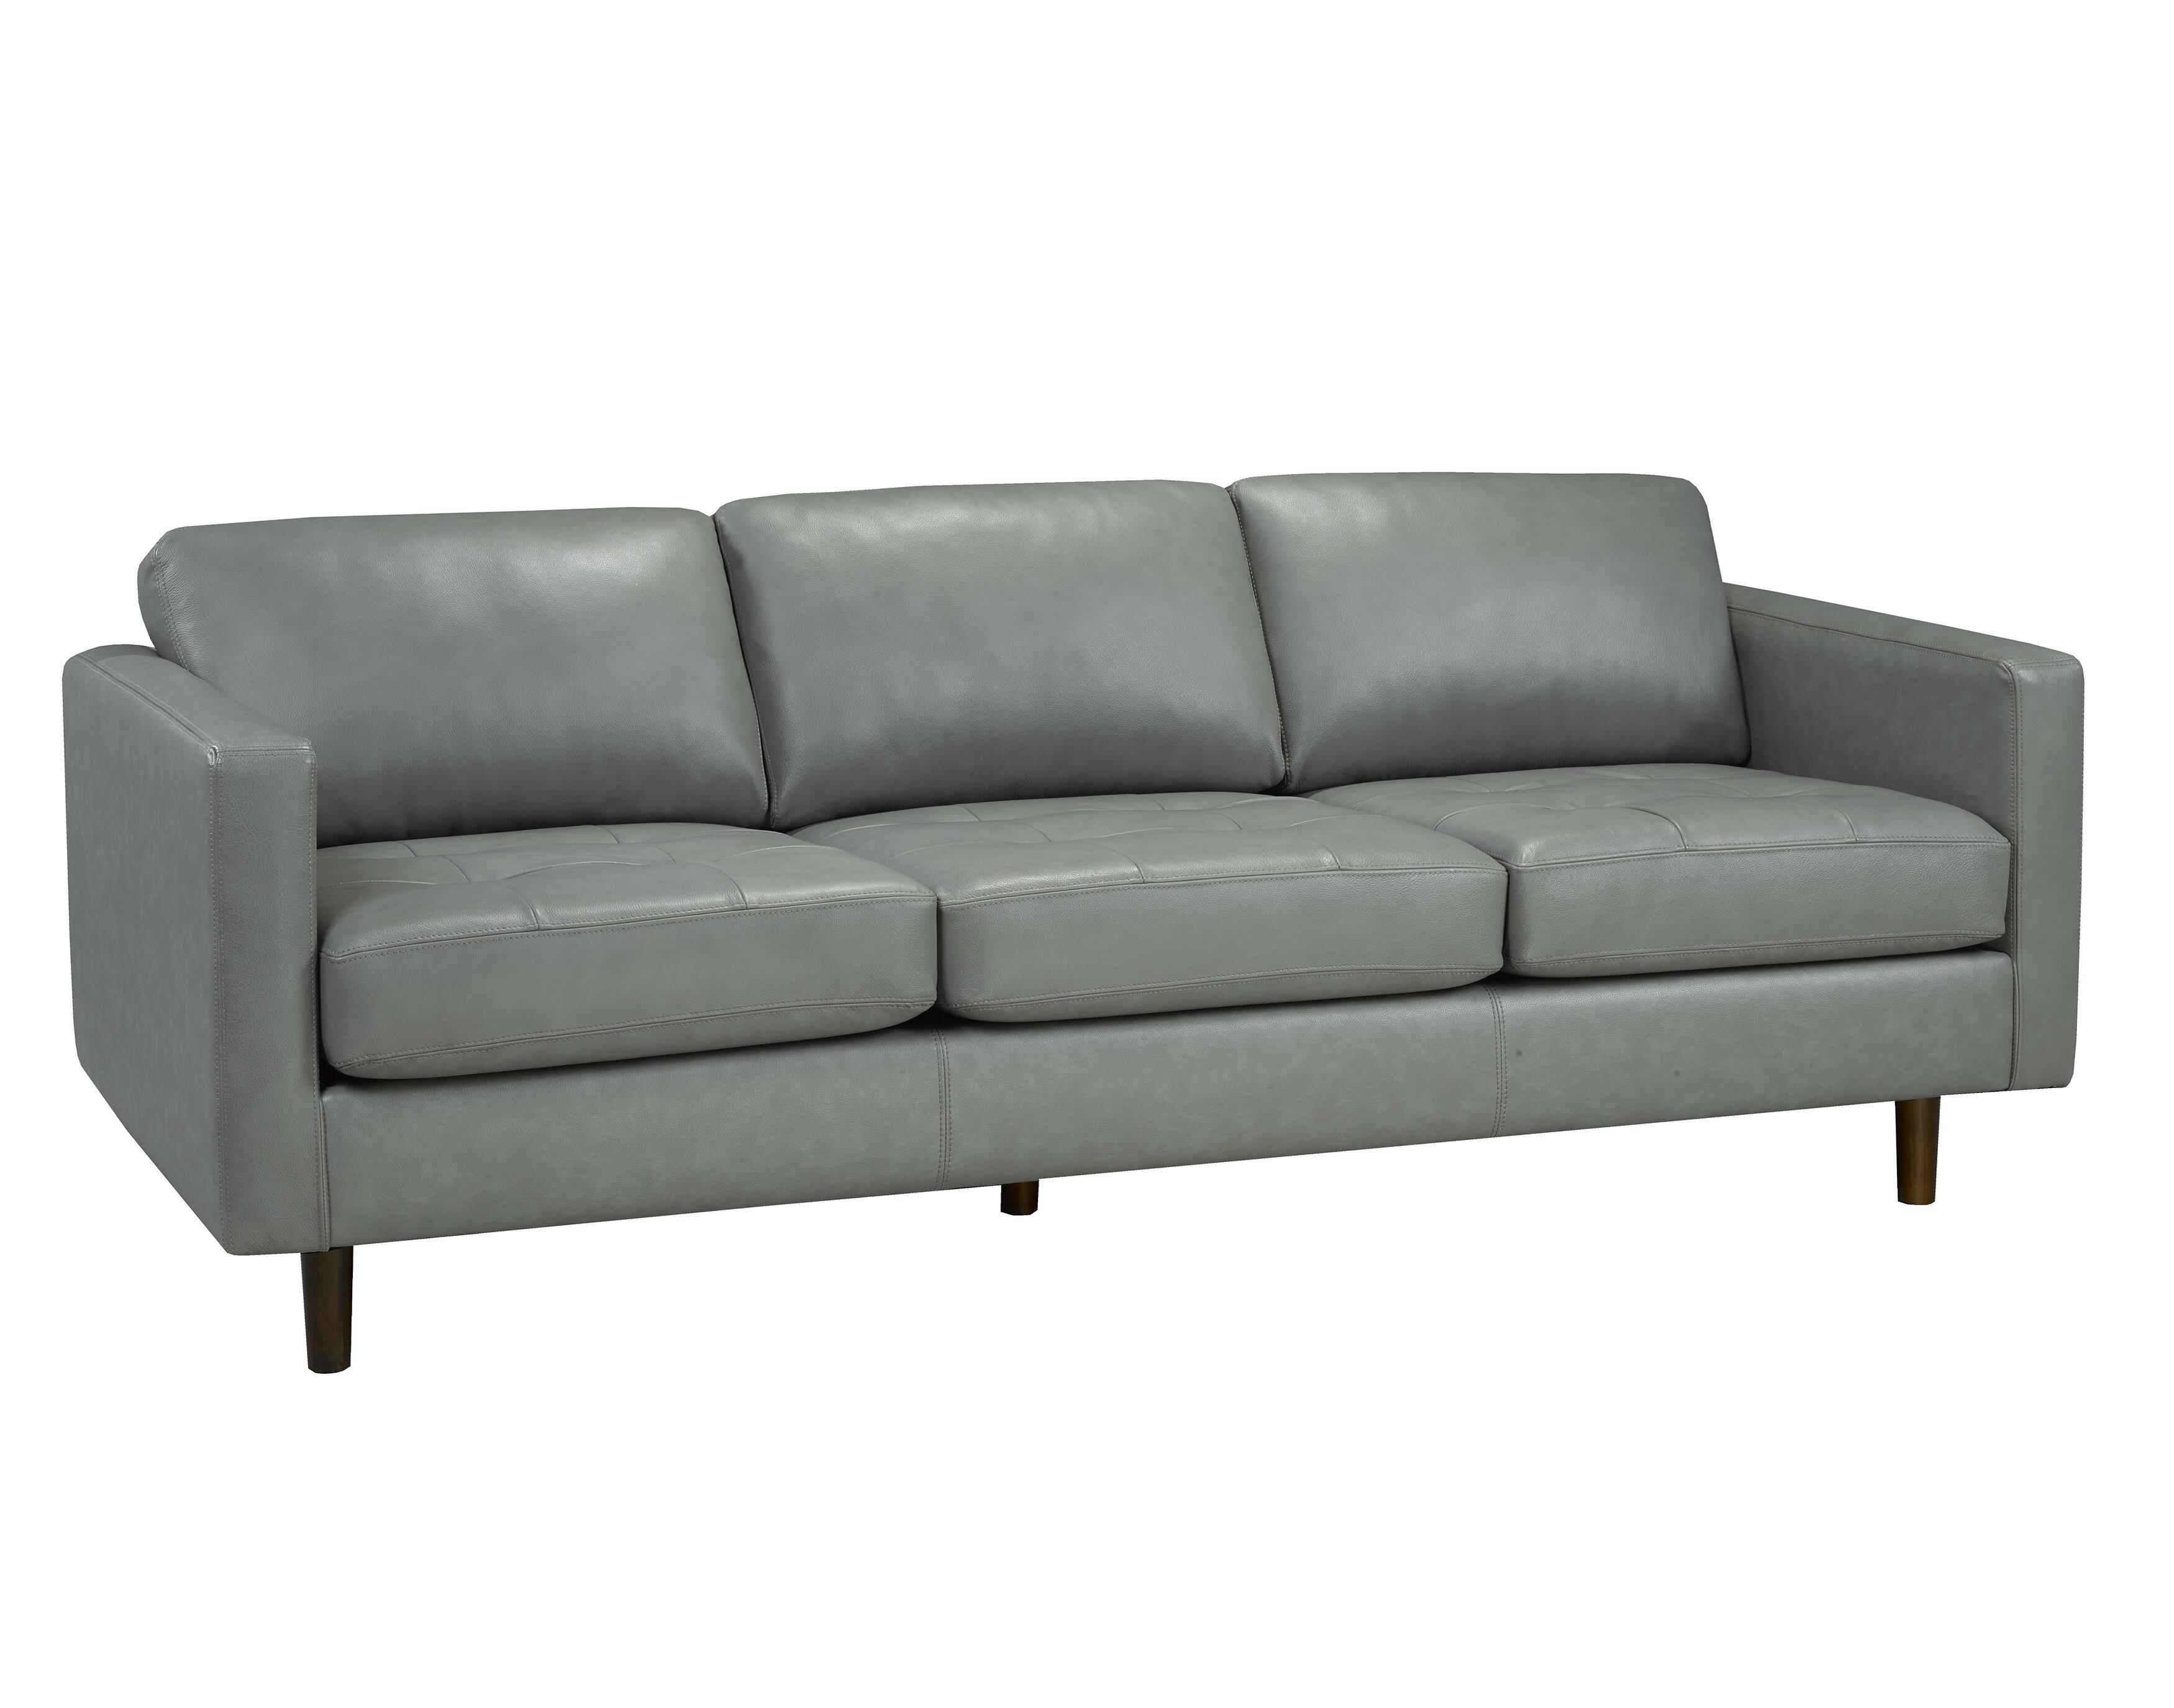 Brayden Studio Lassen Genuine Leather Sofa | Wayfair